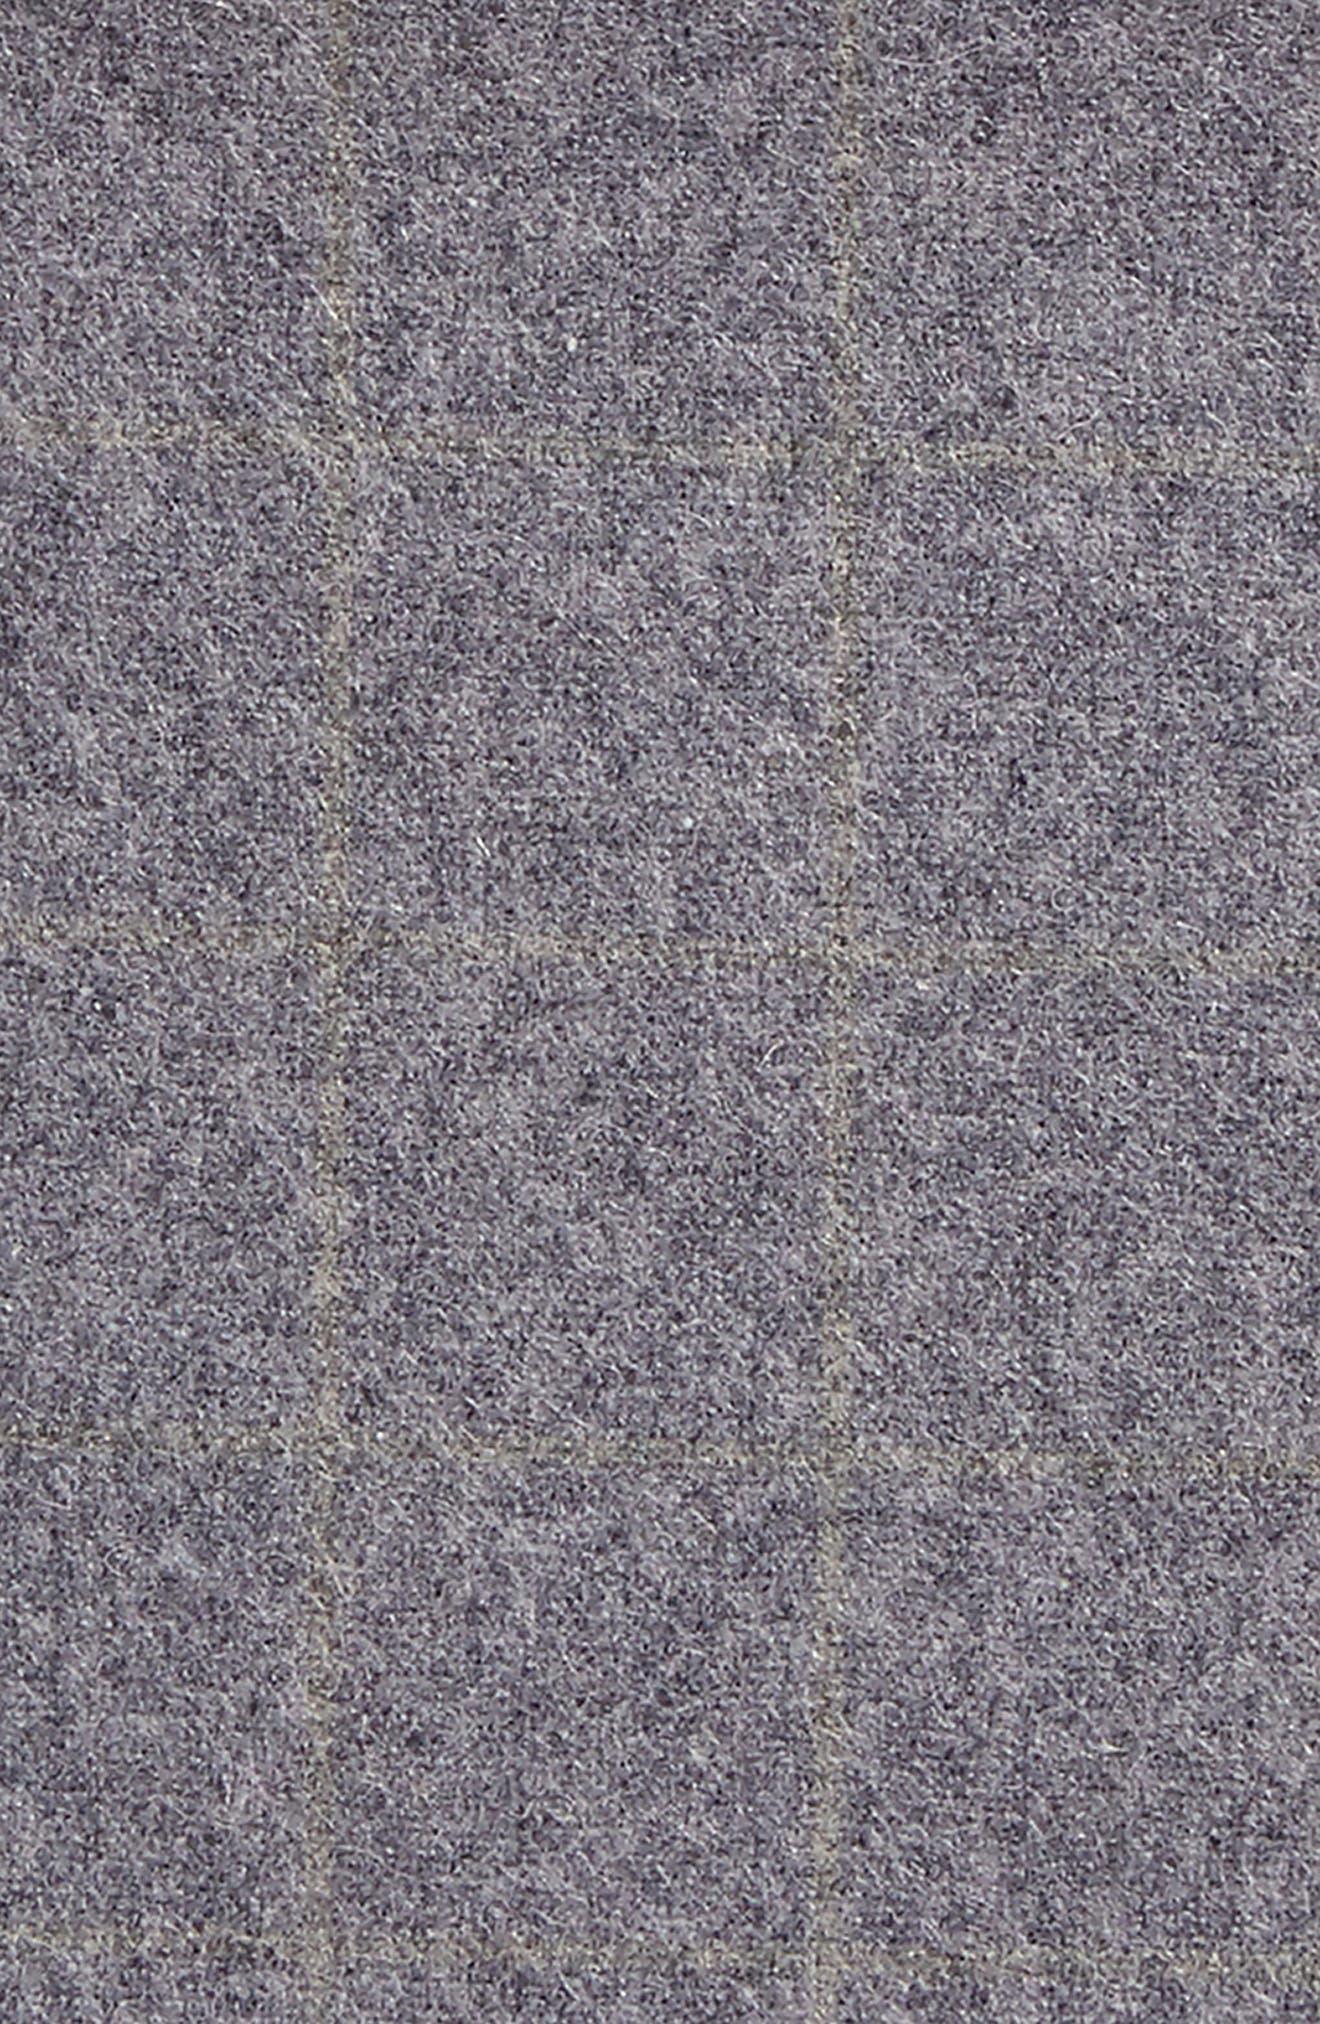 Alternate Image 2  - The Tie Bar Flannel Pocket Square